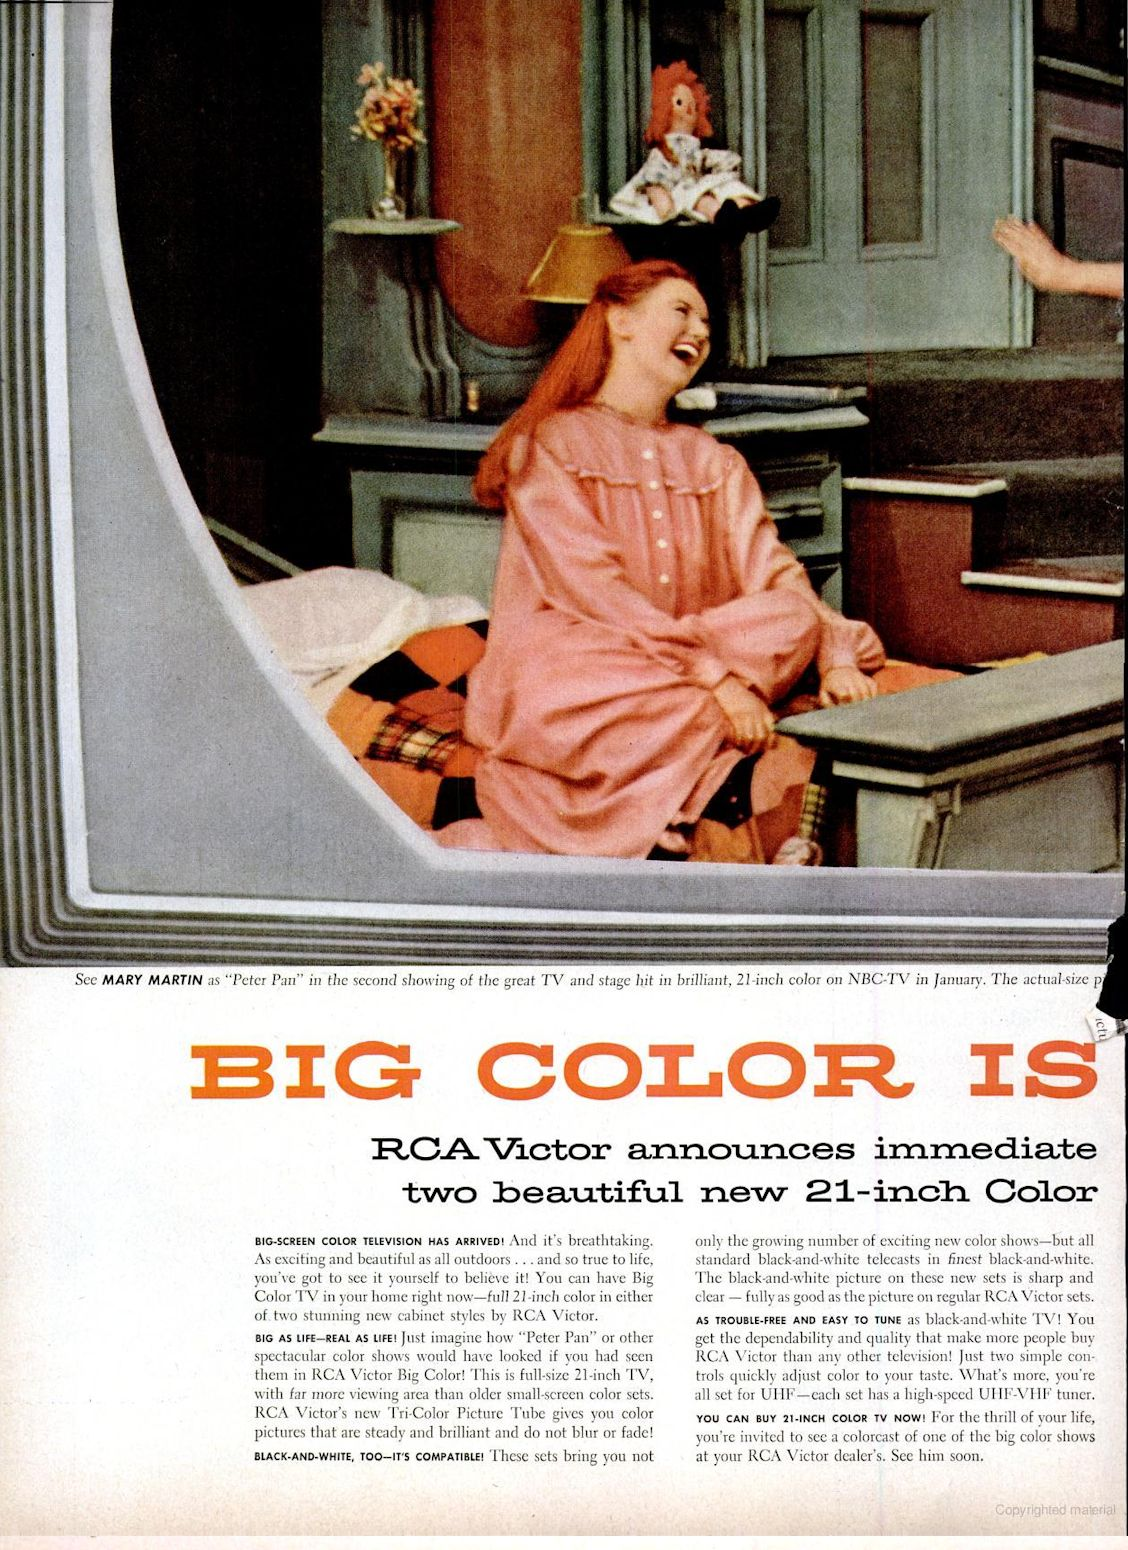 rca model ctc 4 director 21 color television 1955